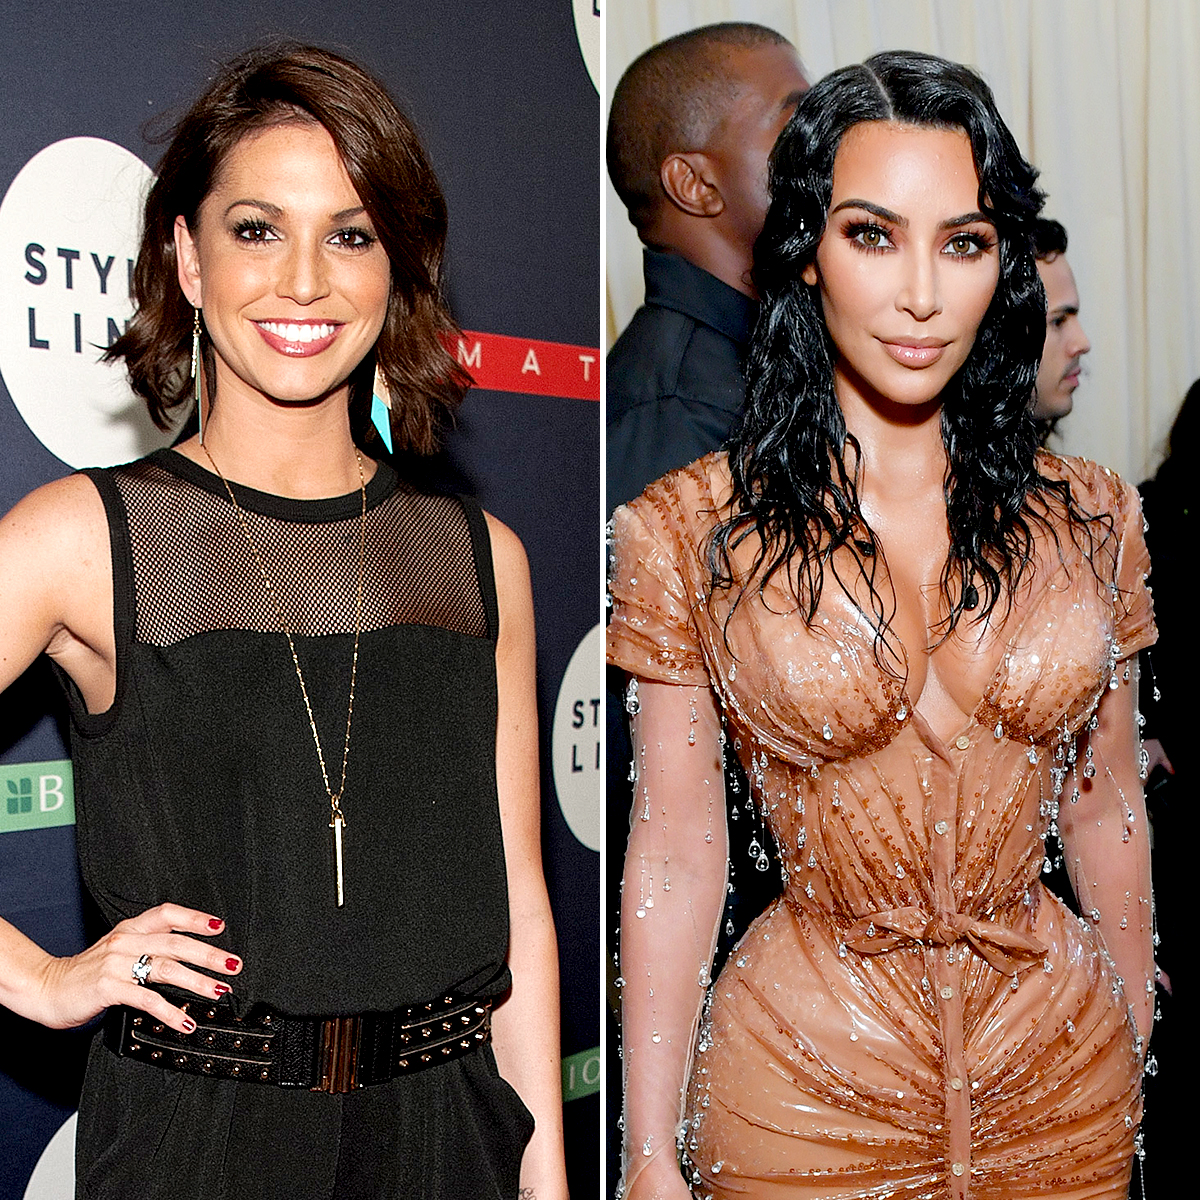 Melissa-Rycroft-Explains-Kim-Kardashian-Met-Gala-Criticism